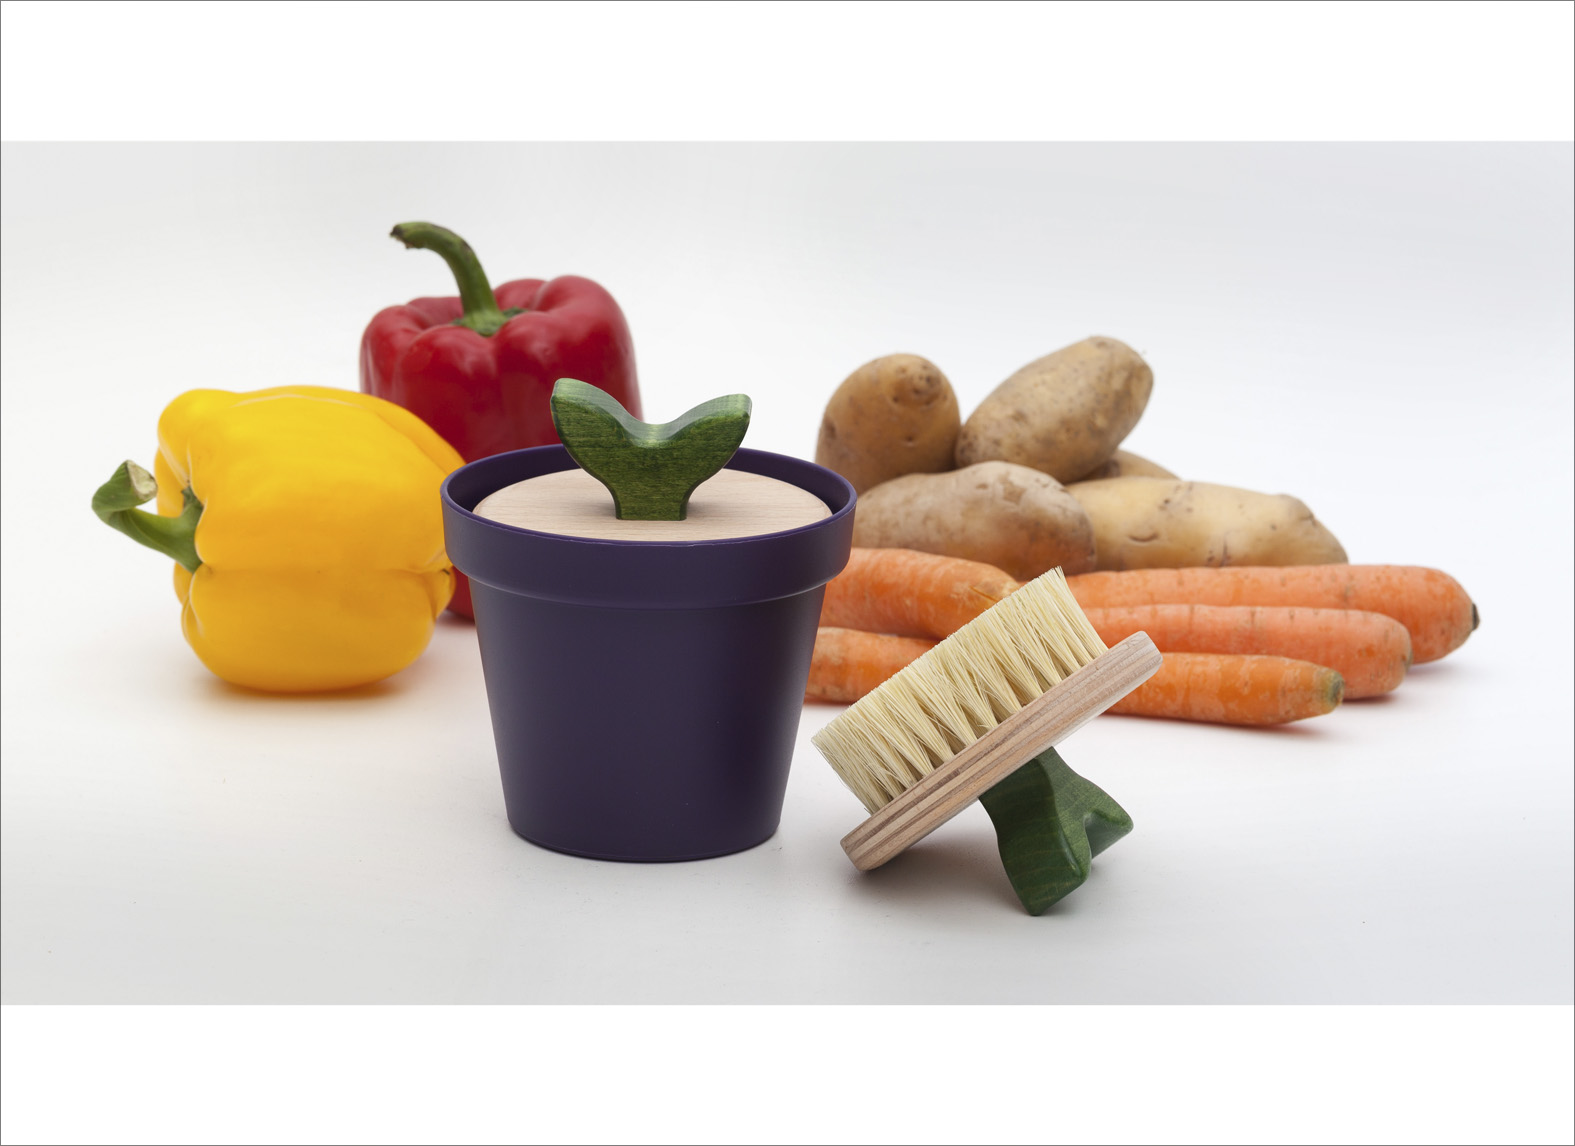 vegetable brush brush.up in purple